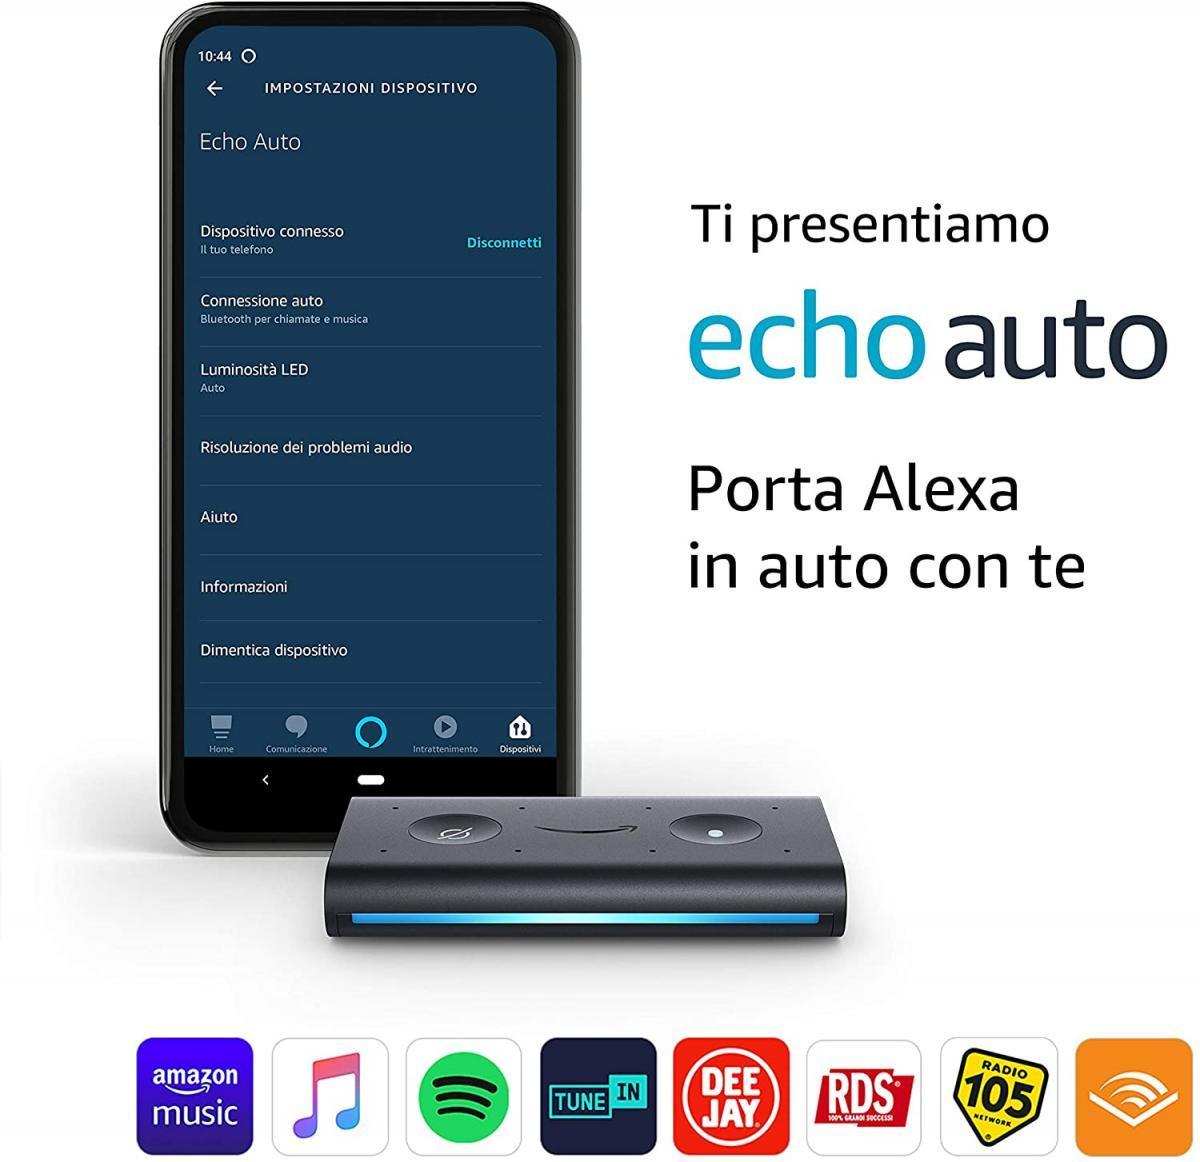 1 - Echo Auto